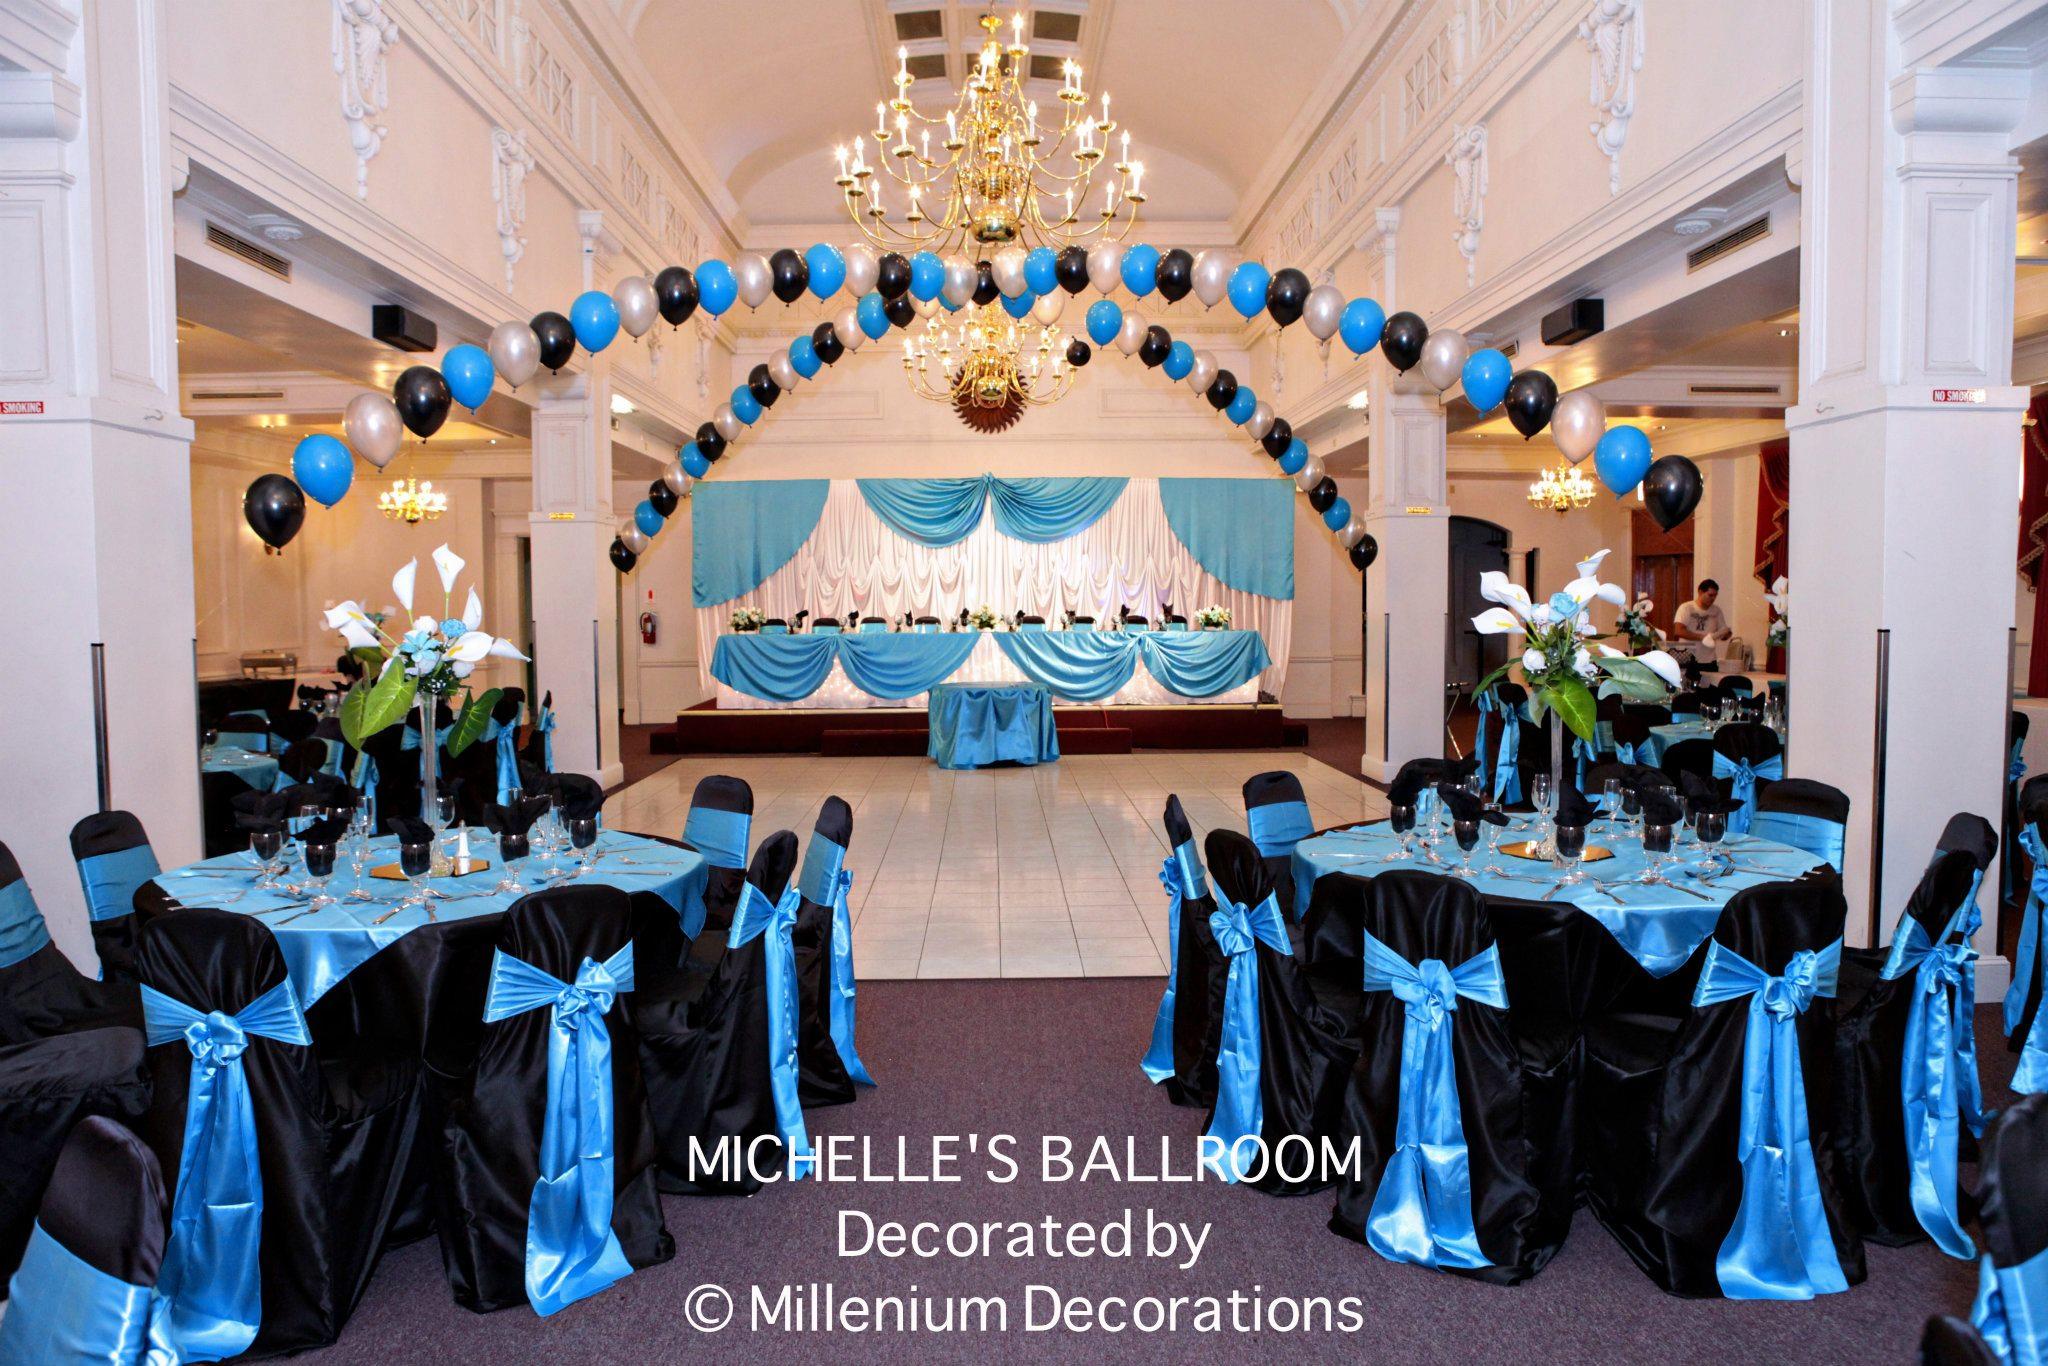 michelles-ballroom